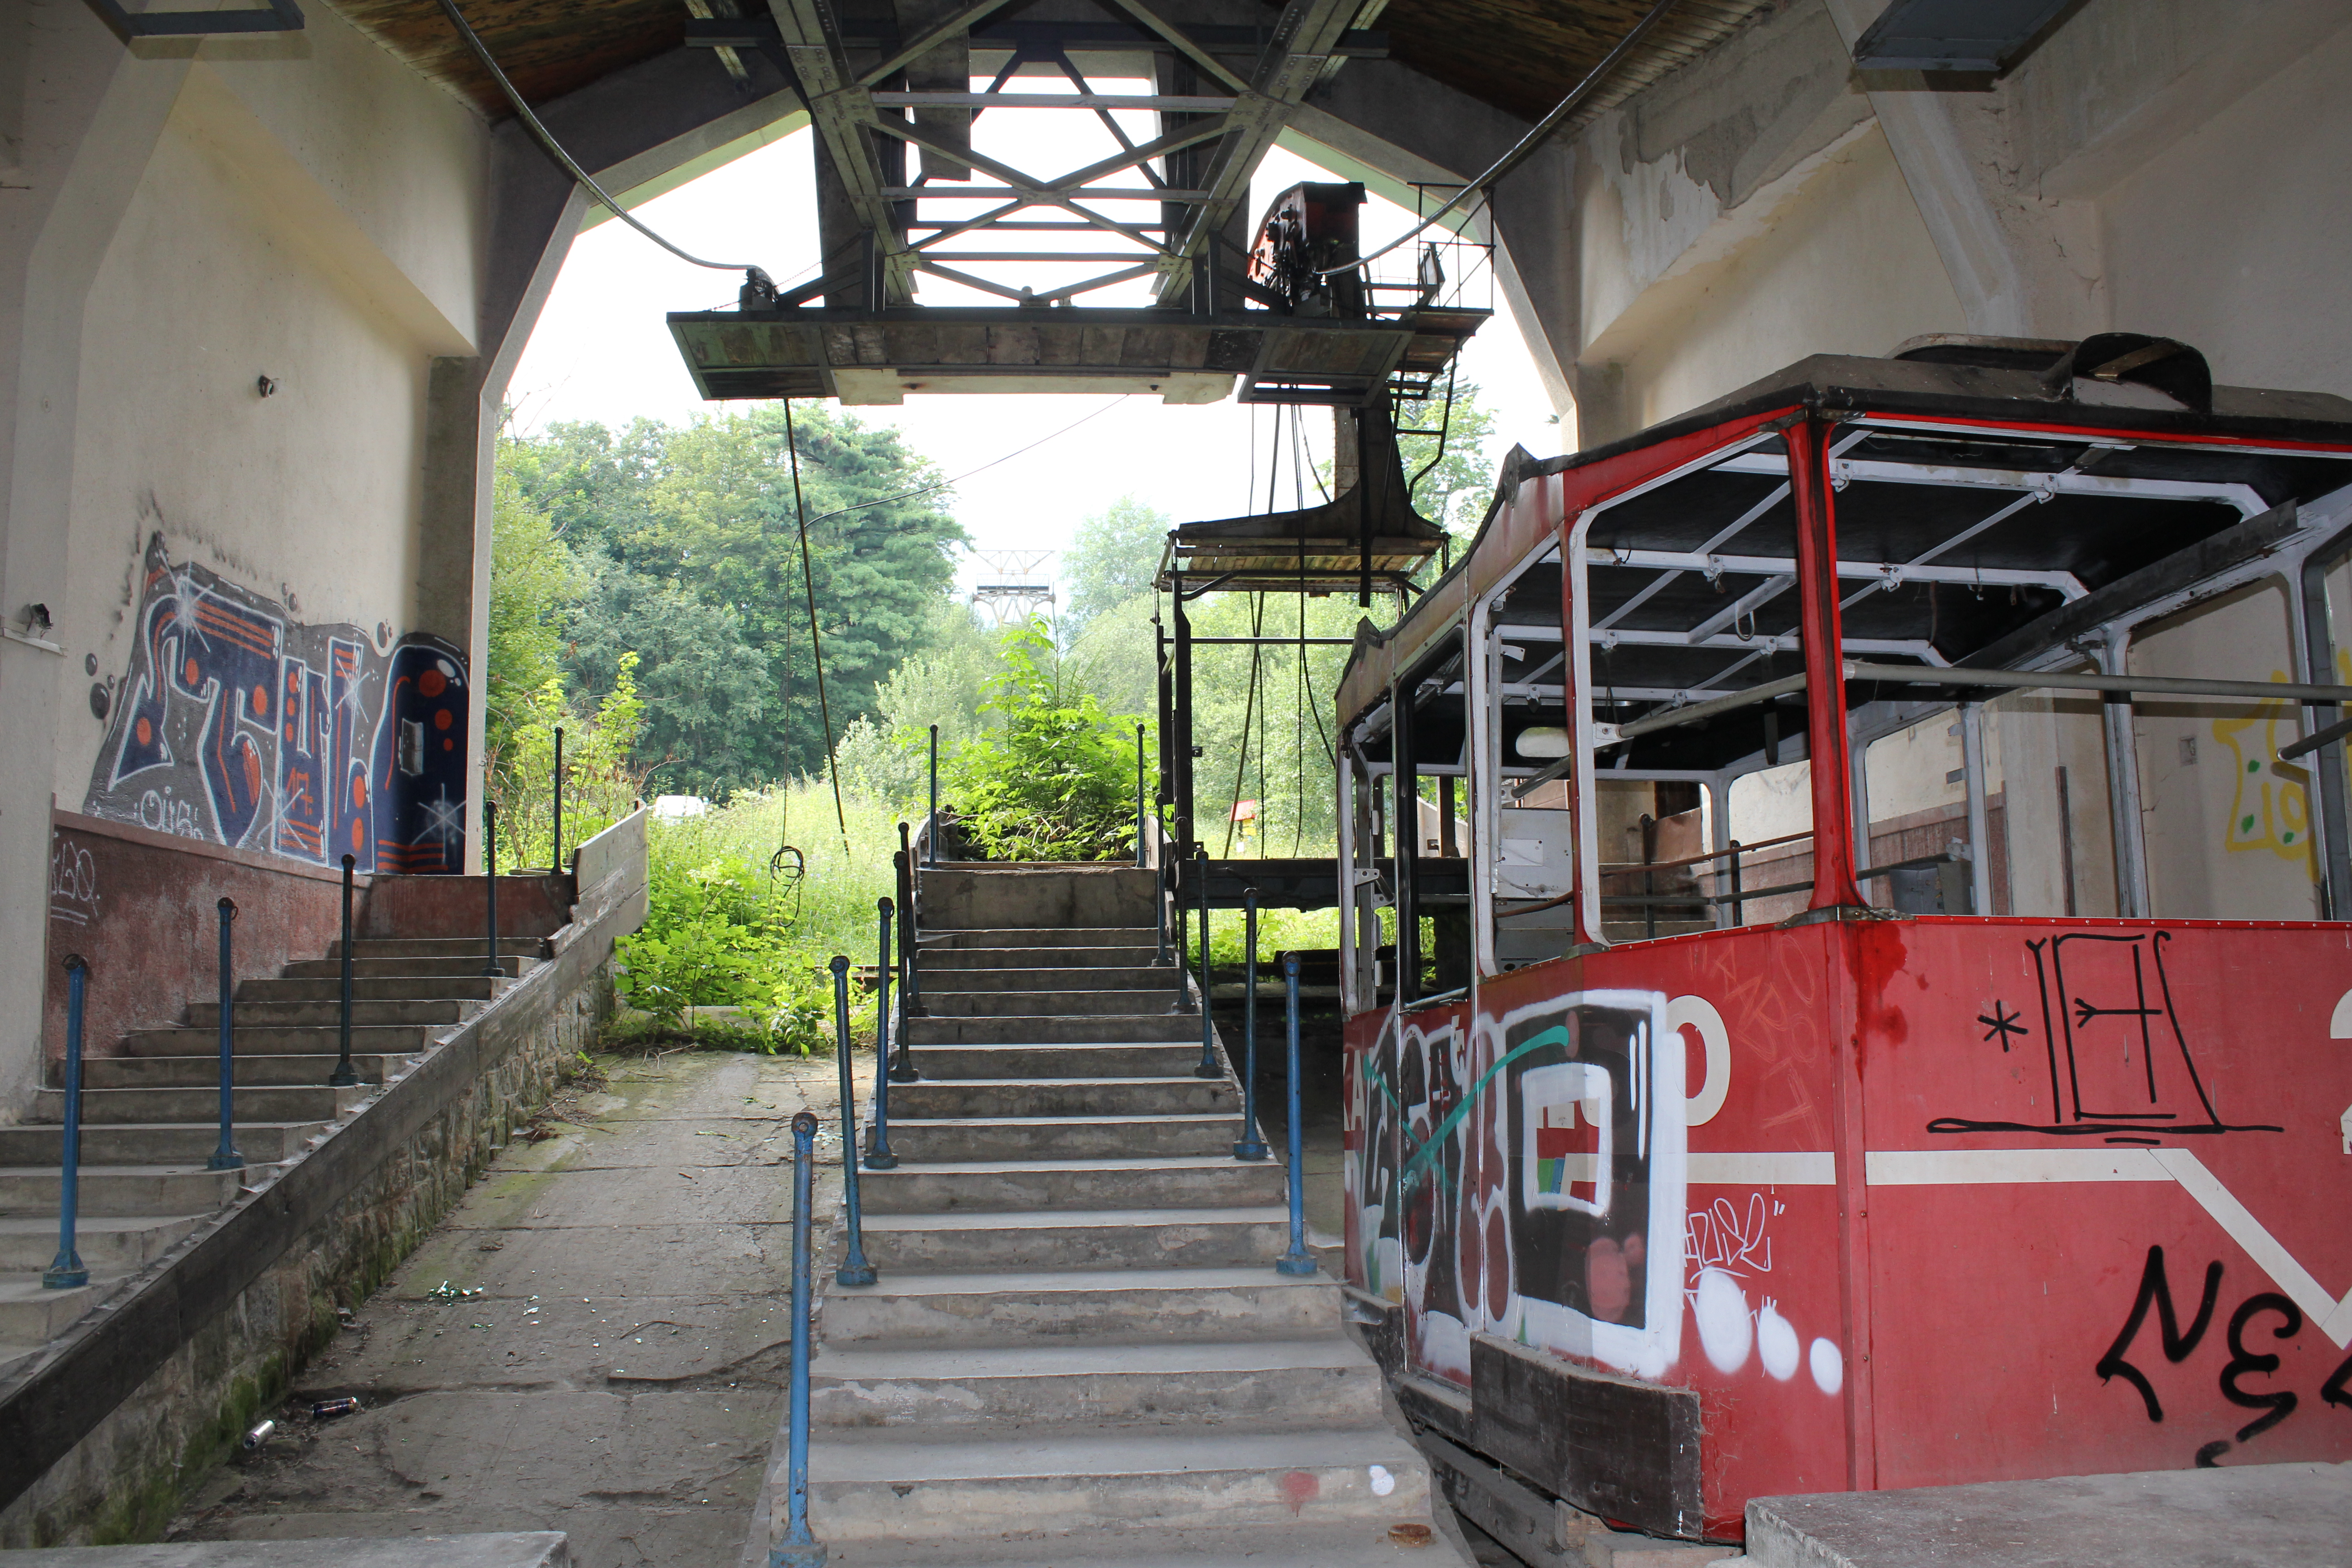 SLOw Tatra lomnica kabelbaan verval gezien (11) - kopie